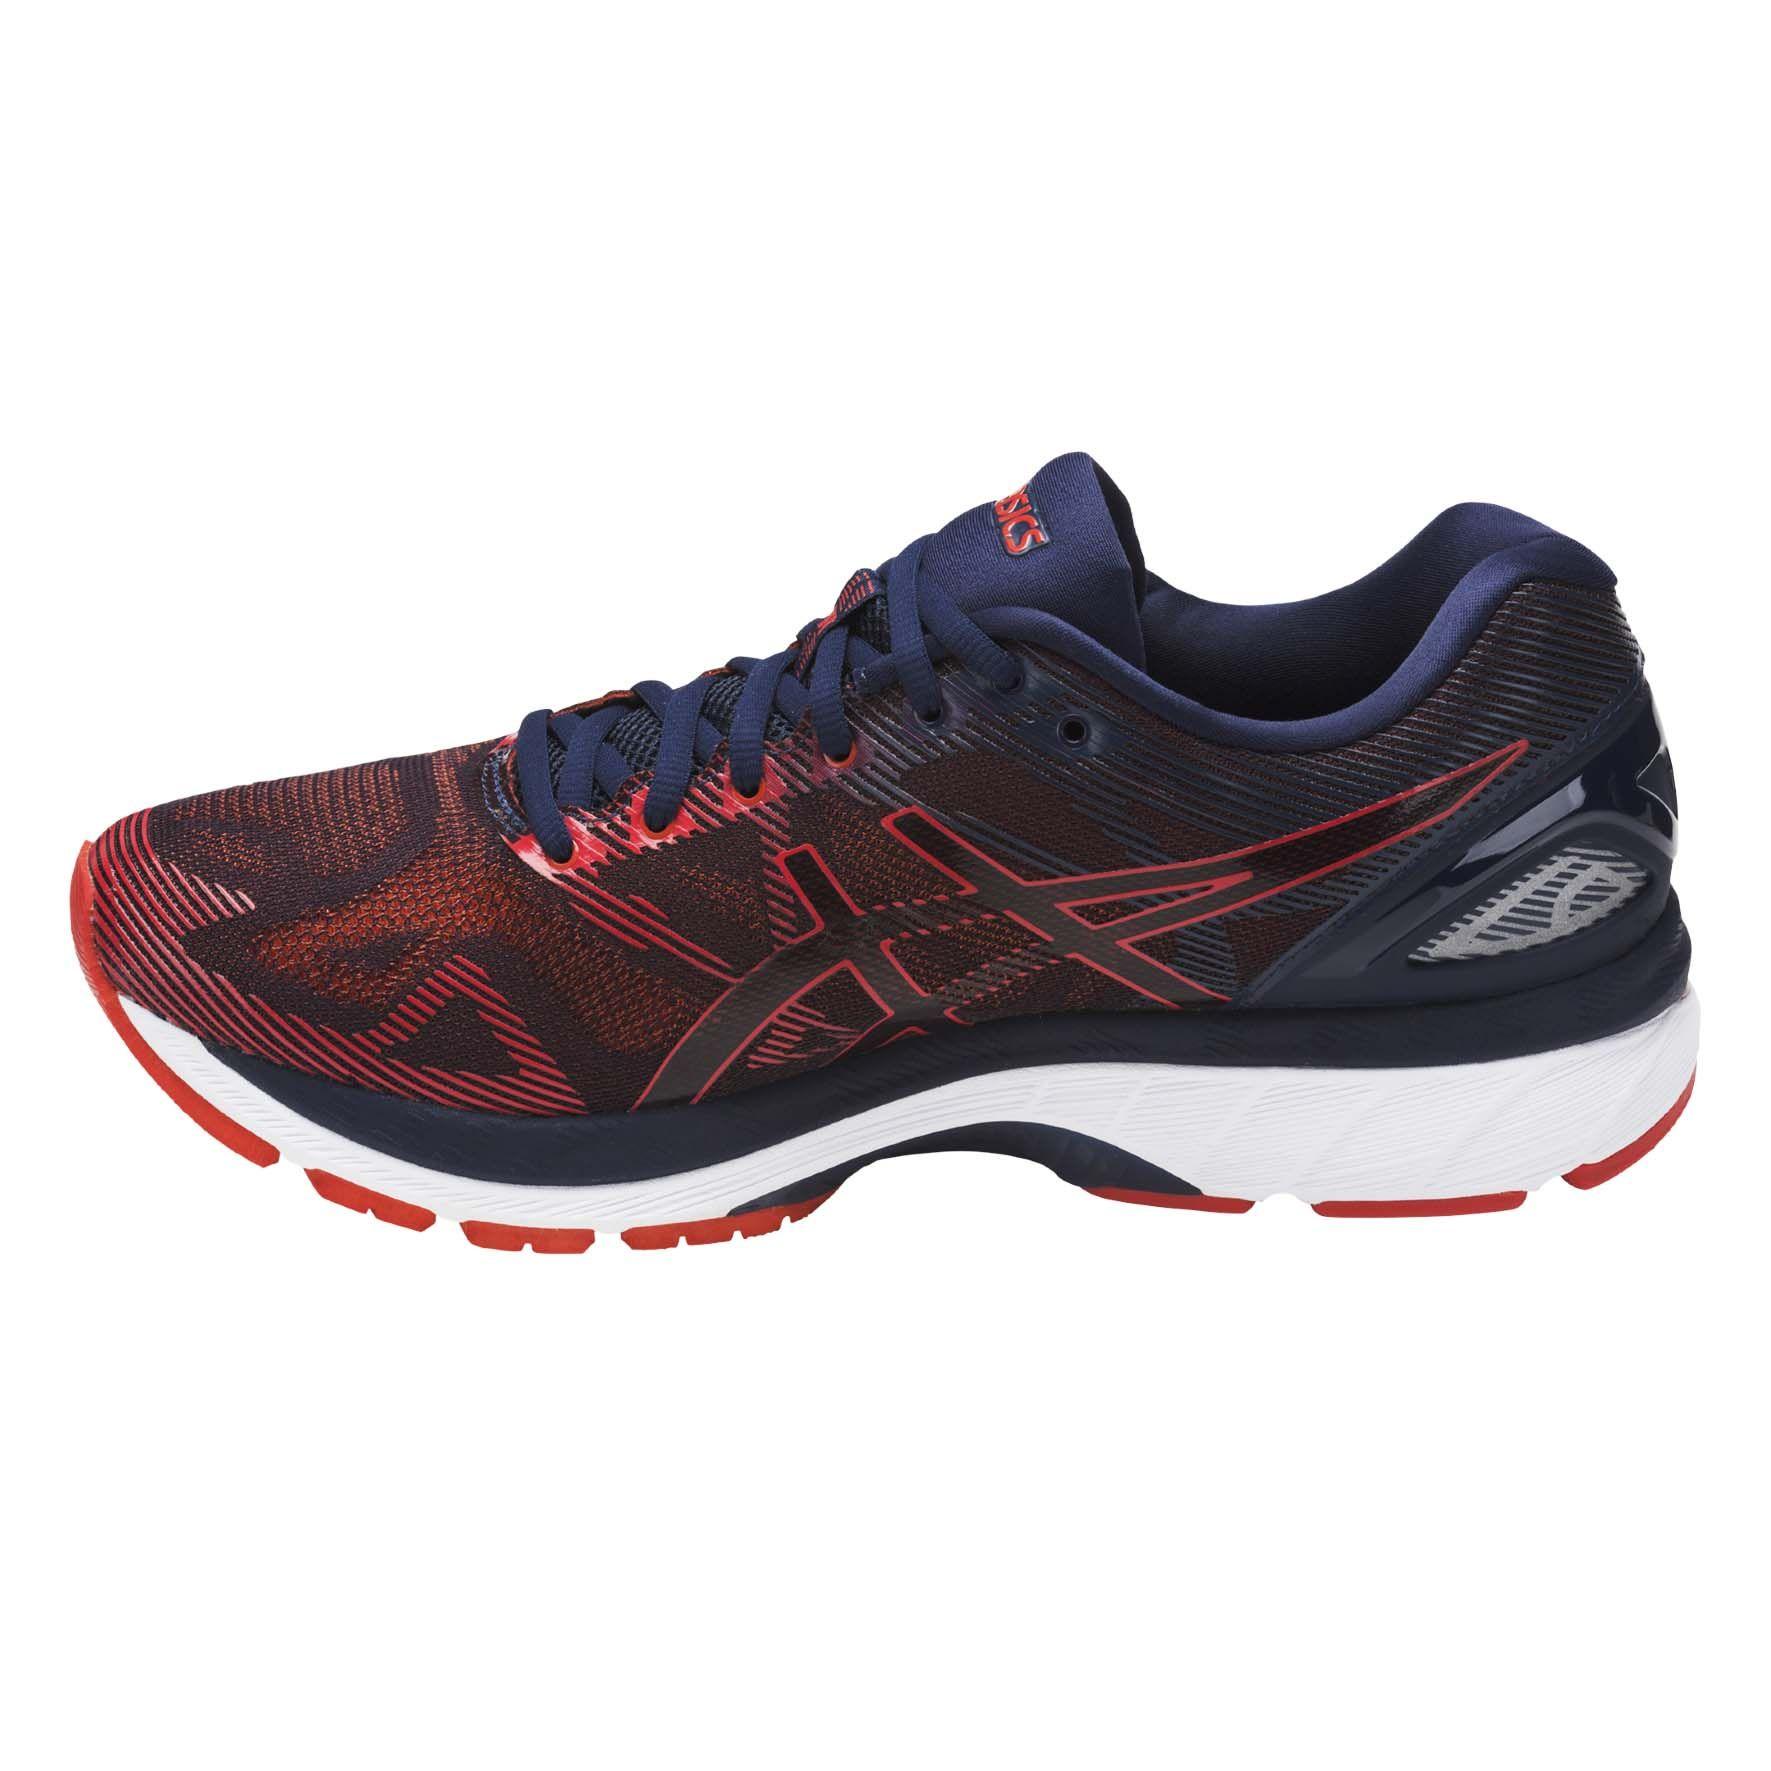 Asics Nimbus Running Shoes Sale